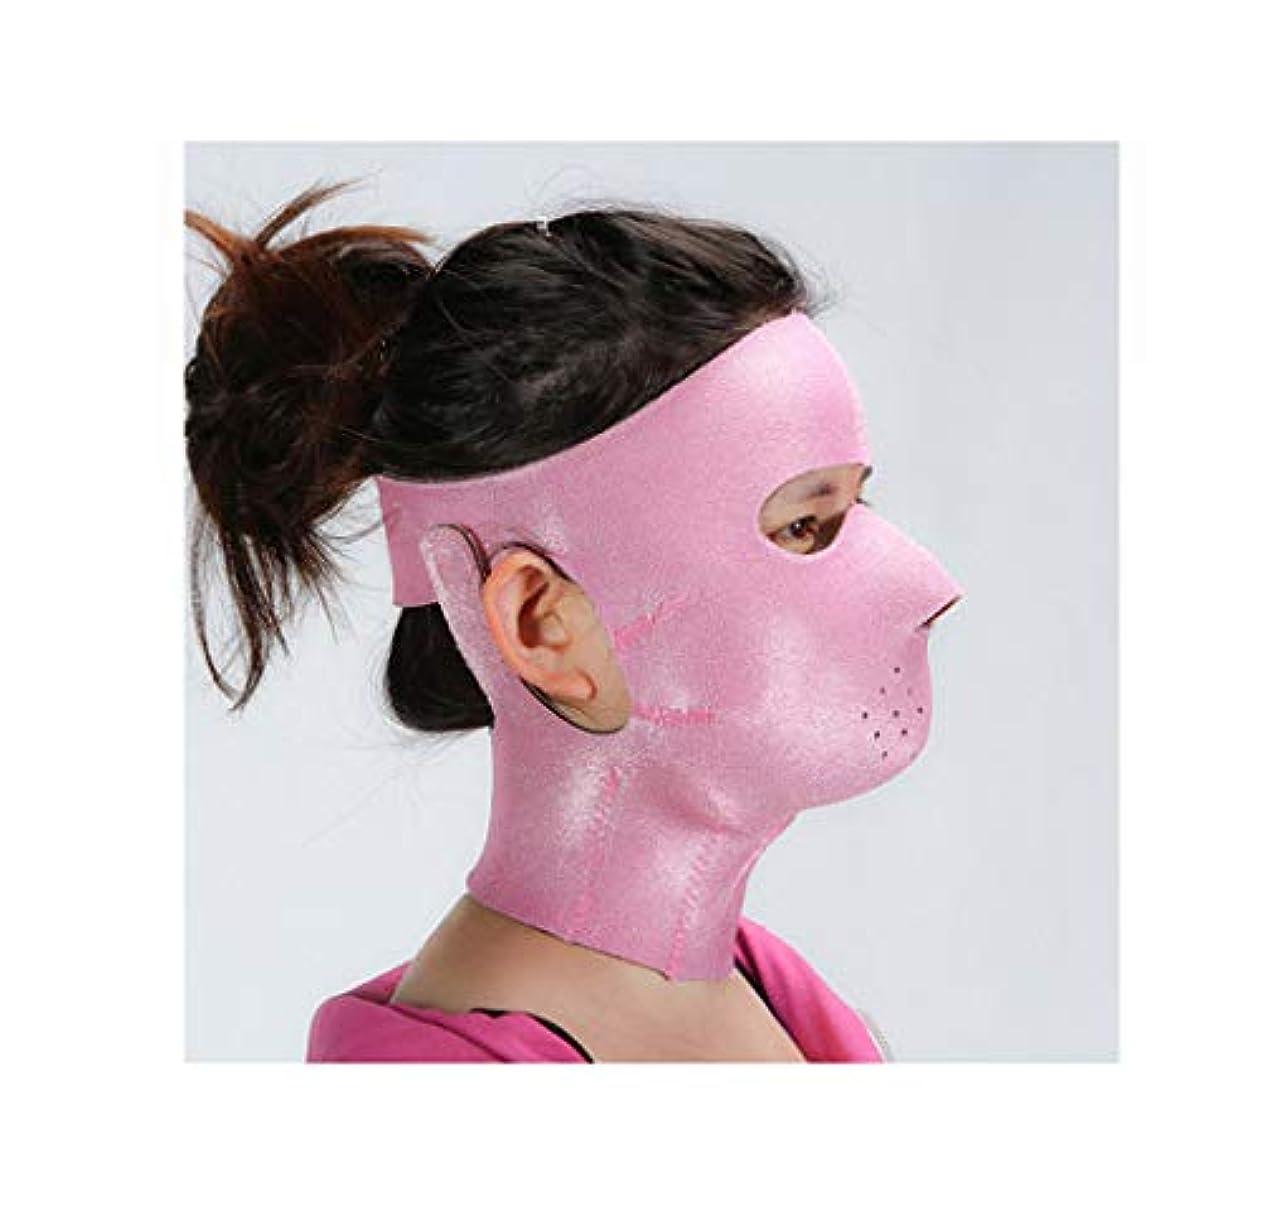 TLMY 薄い顔マスクマスクプラス薄いマスク引き締めアンチエイジング薄いマスク顔の薄い顔マスクアーティファクト美容ネックバンド 顔用整形マスク